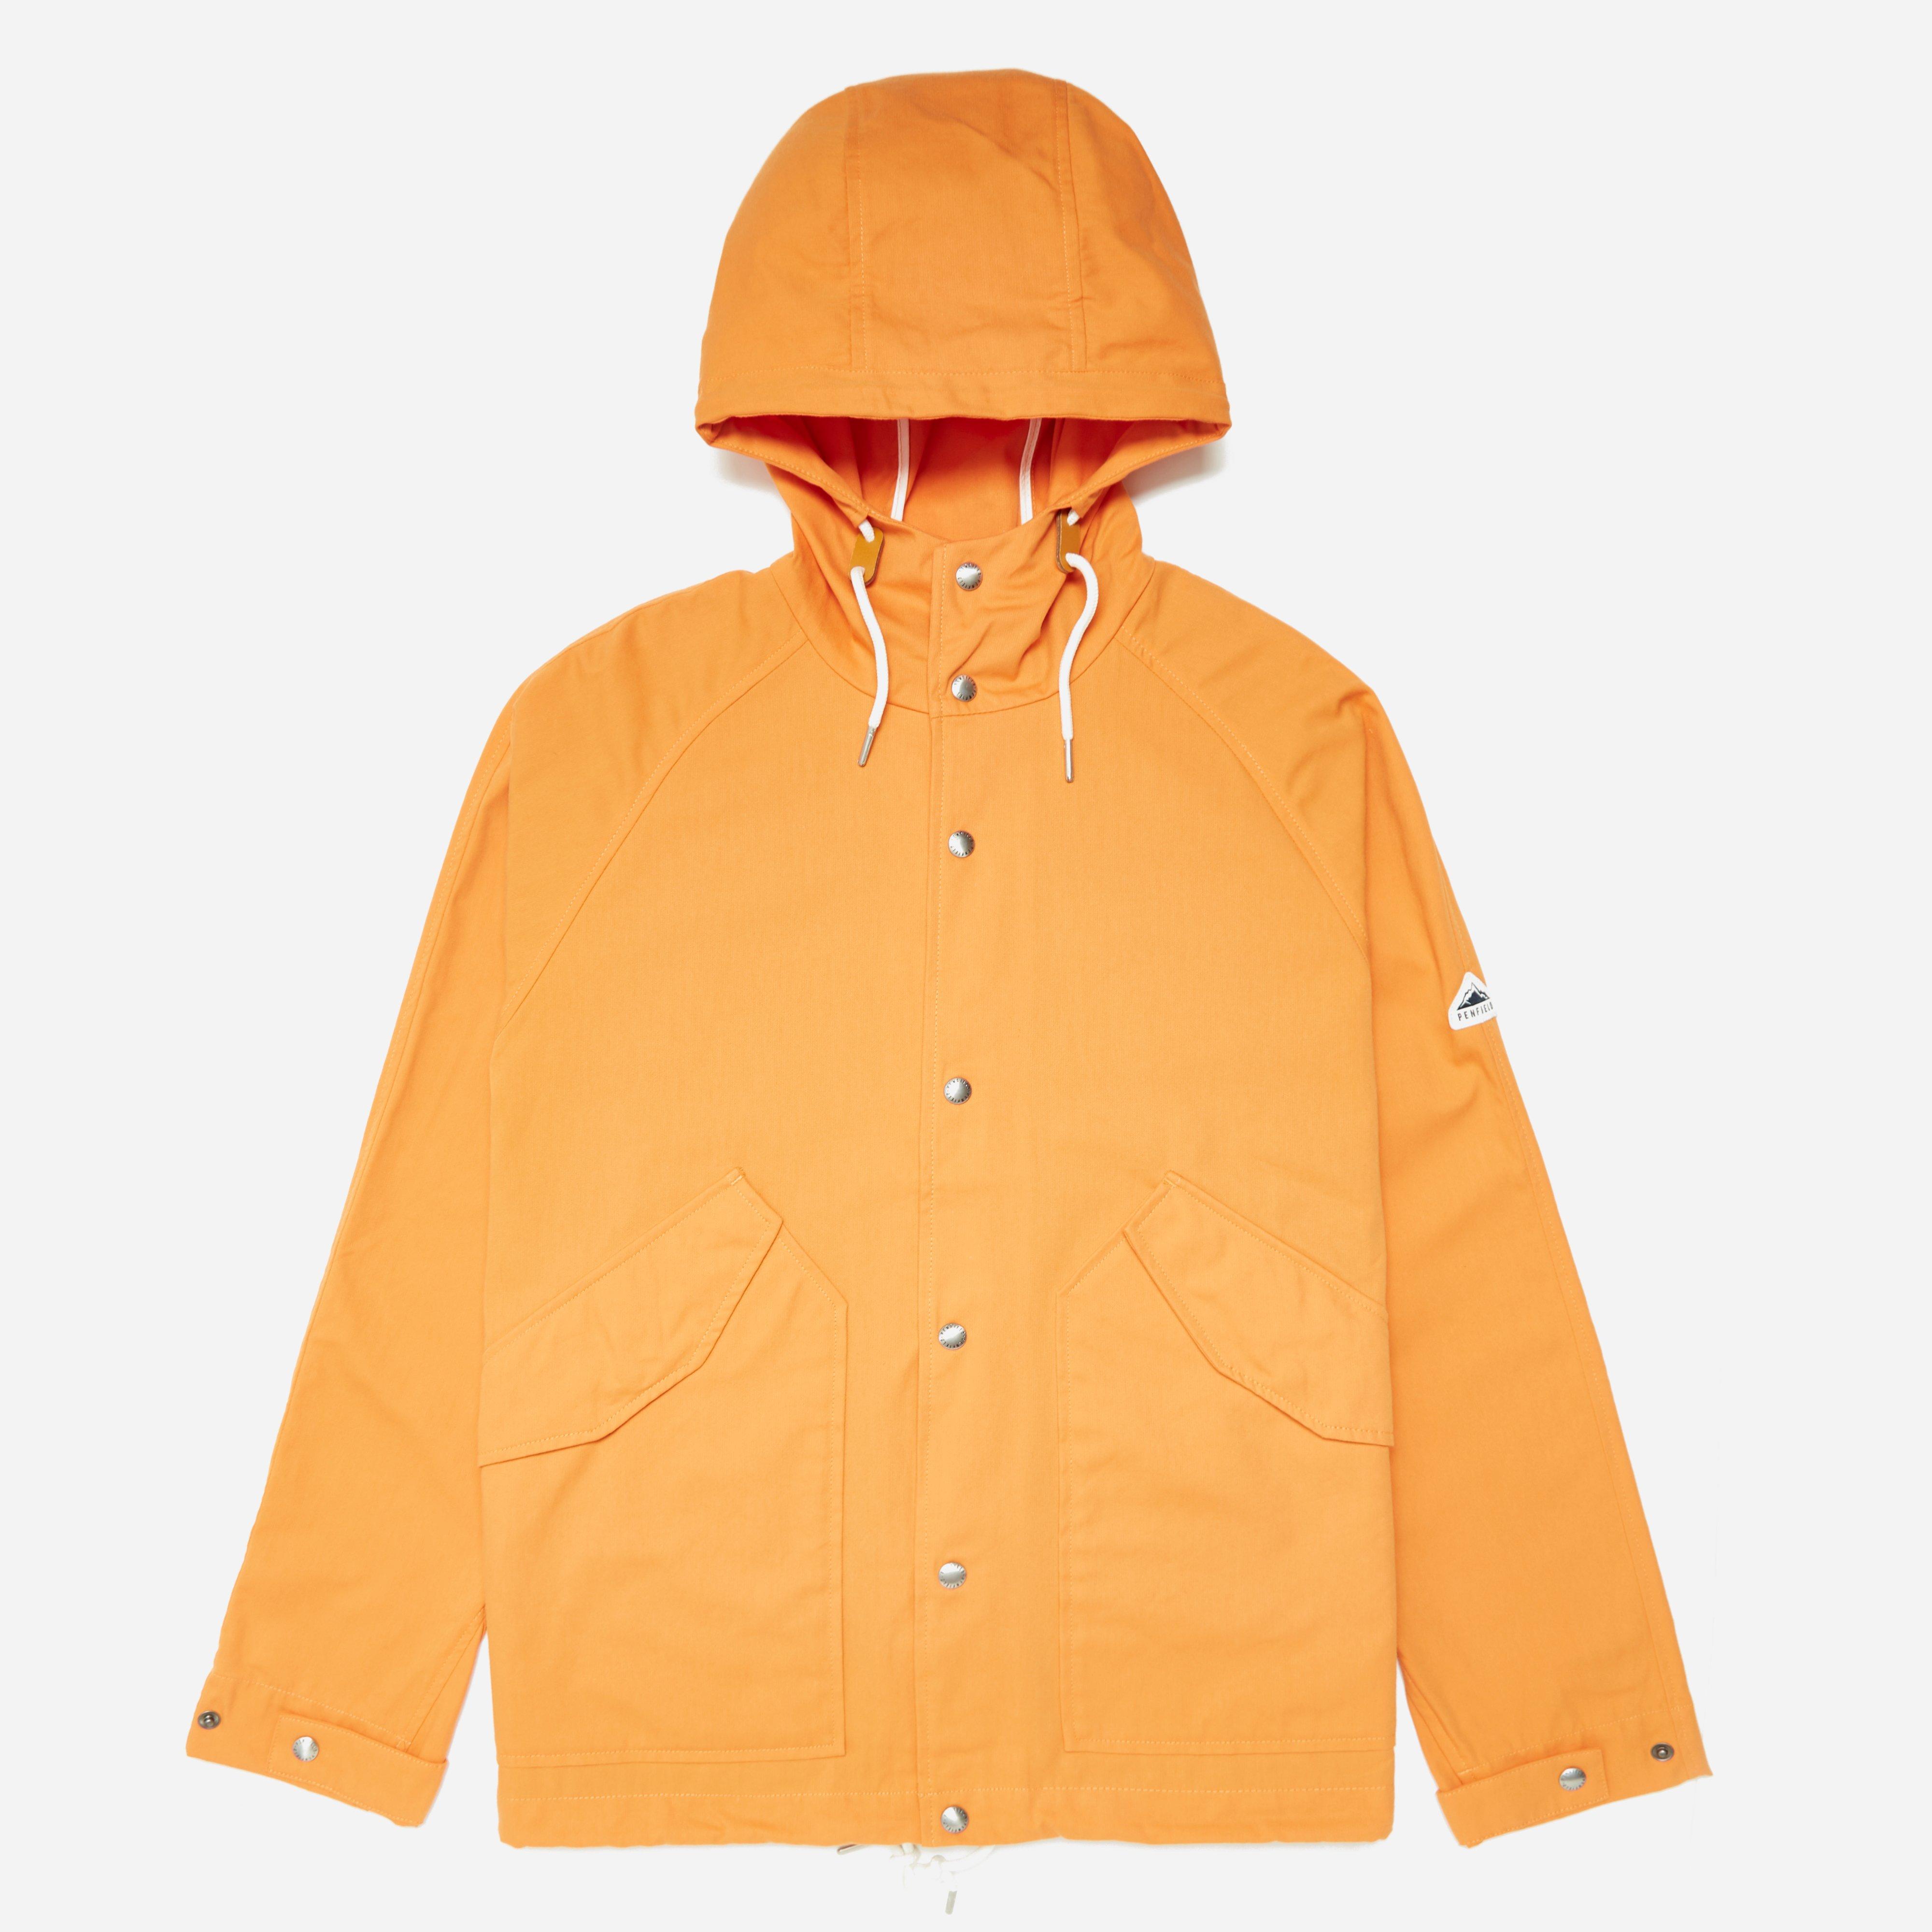 Penfield Davenport Jacket